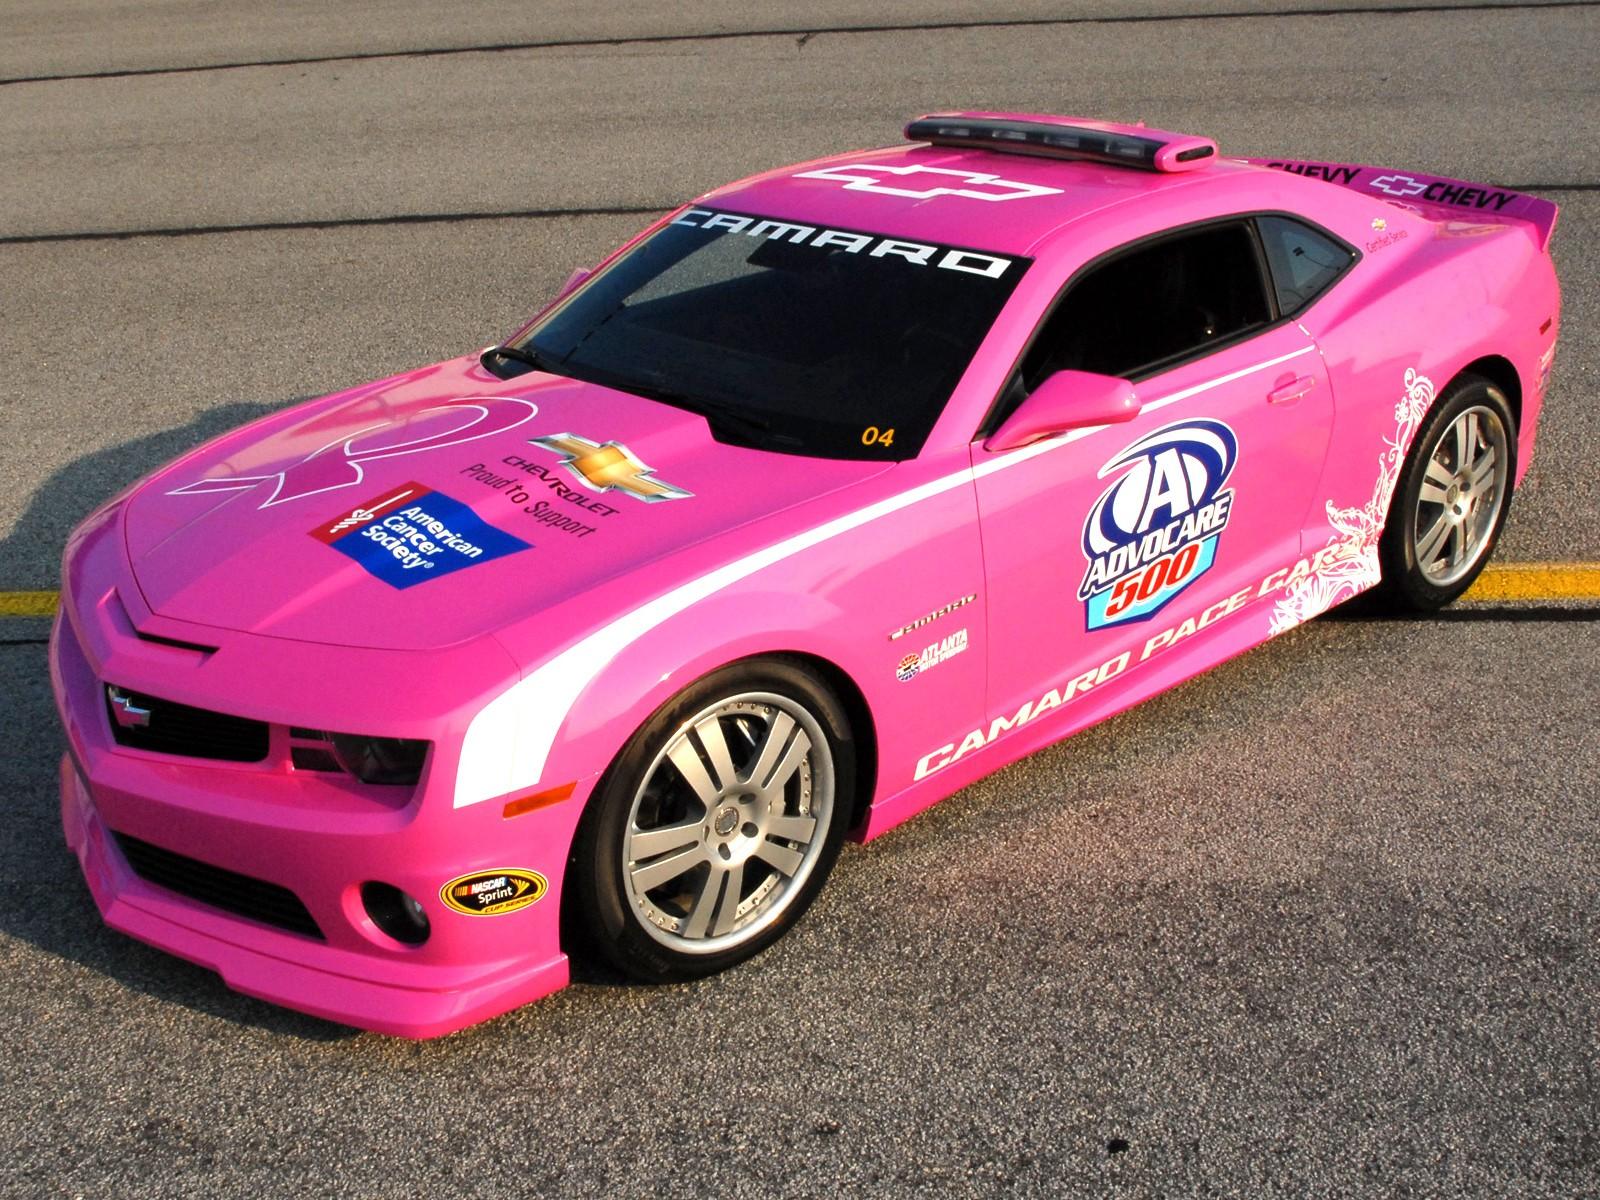 Auto rosado - 1600x1200